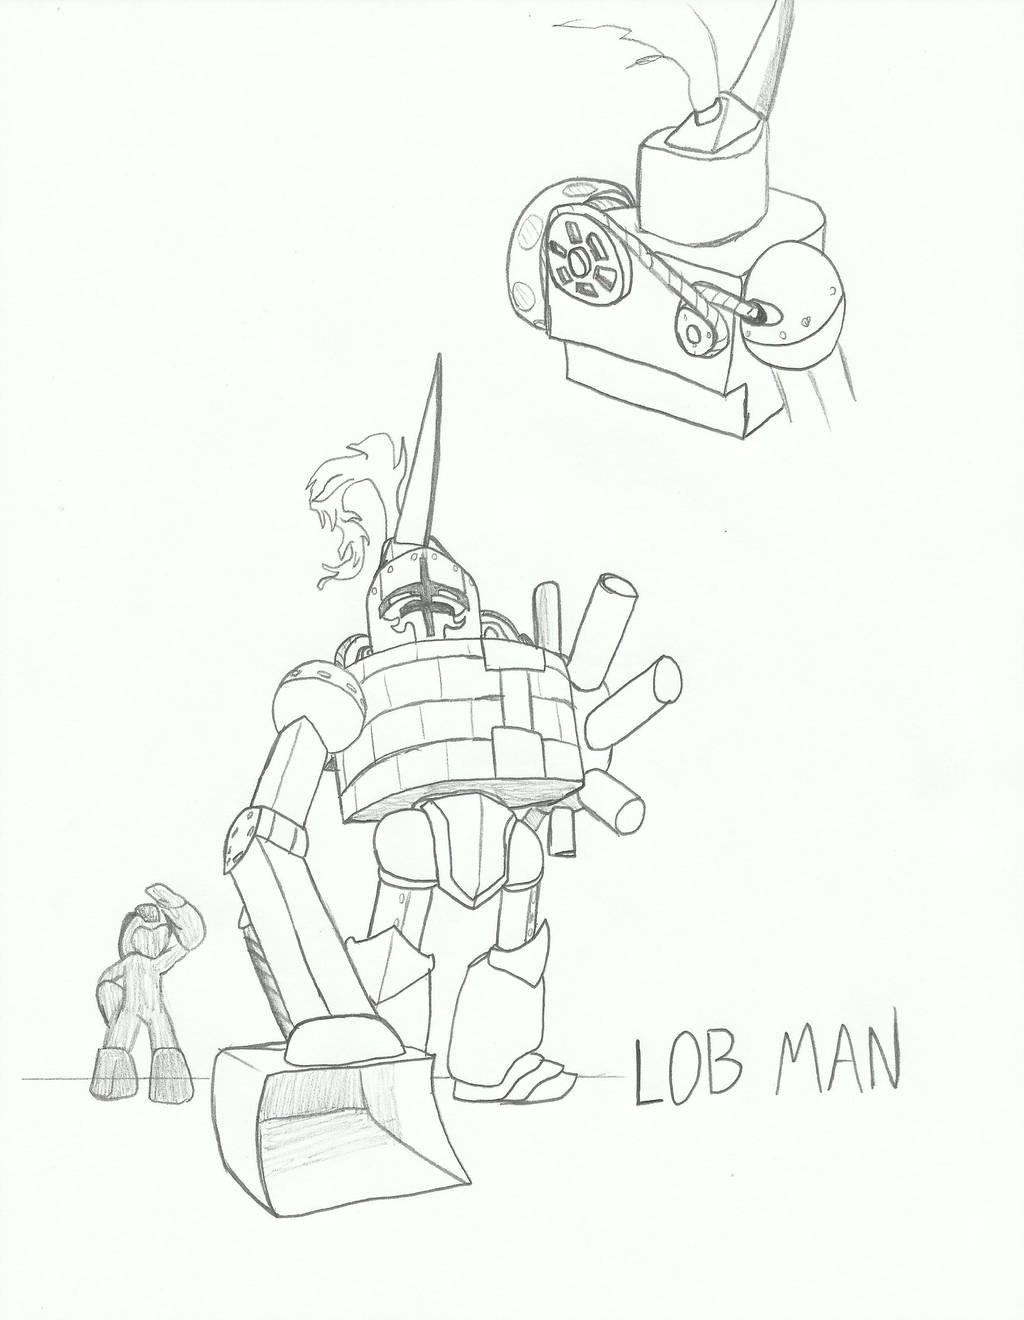 unstablereactor mega man robot master oc lob man by unstablereactor